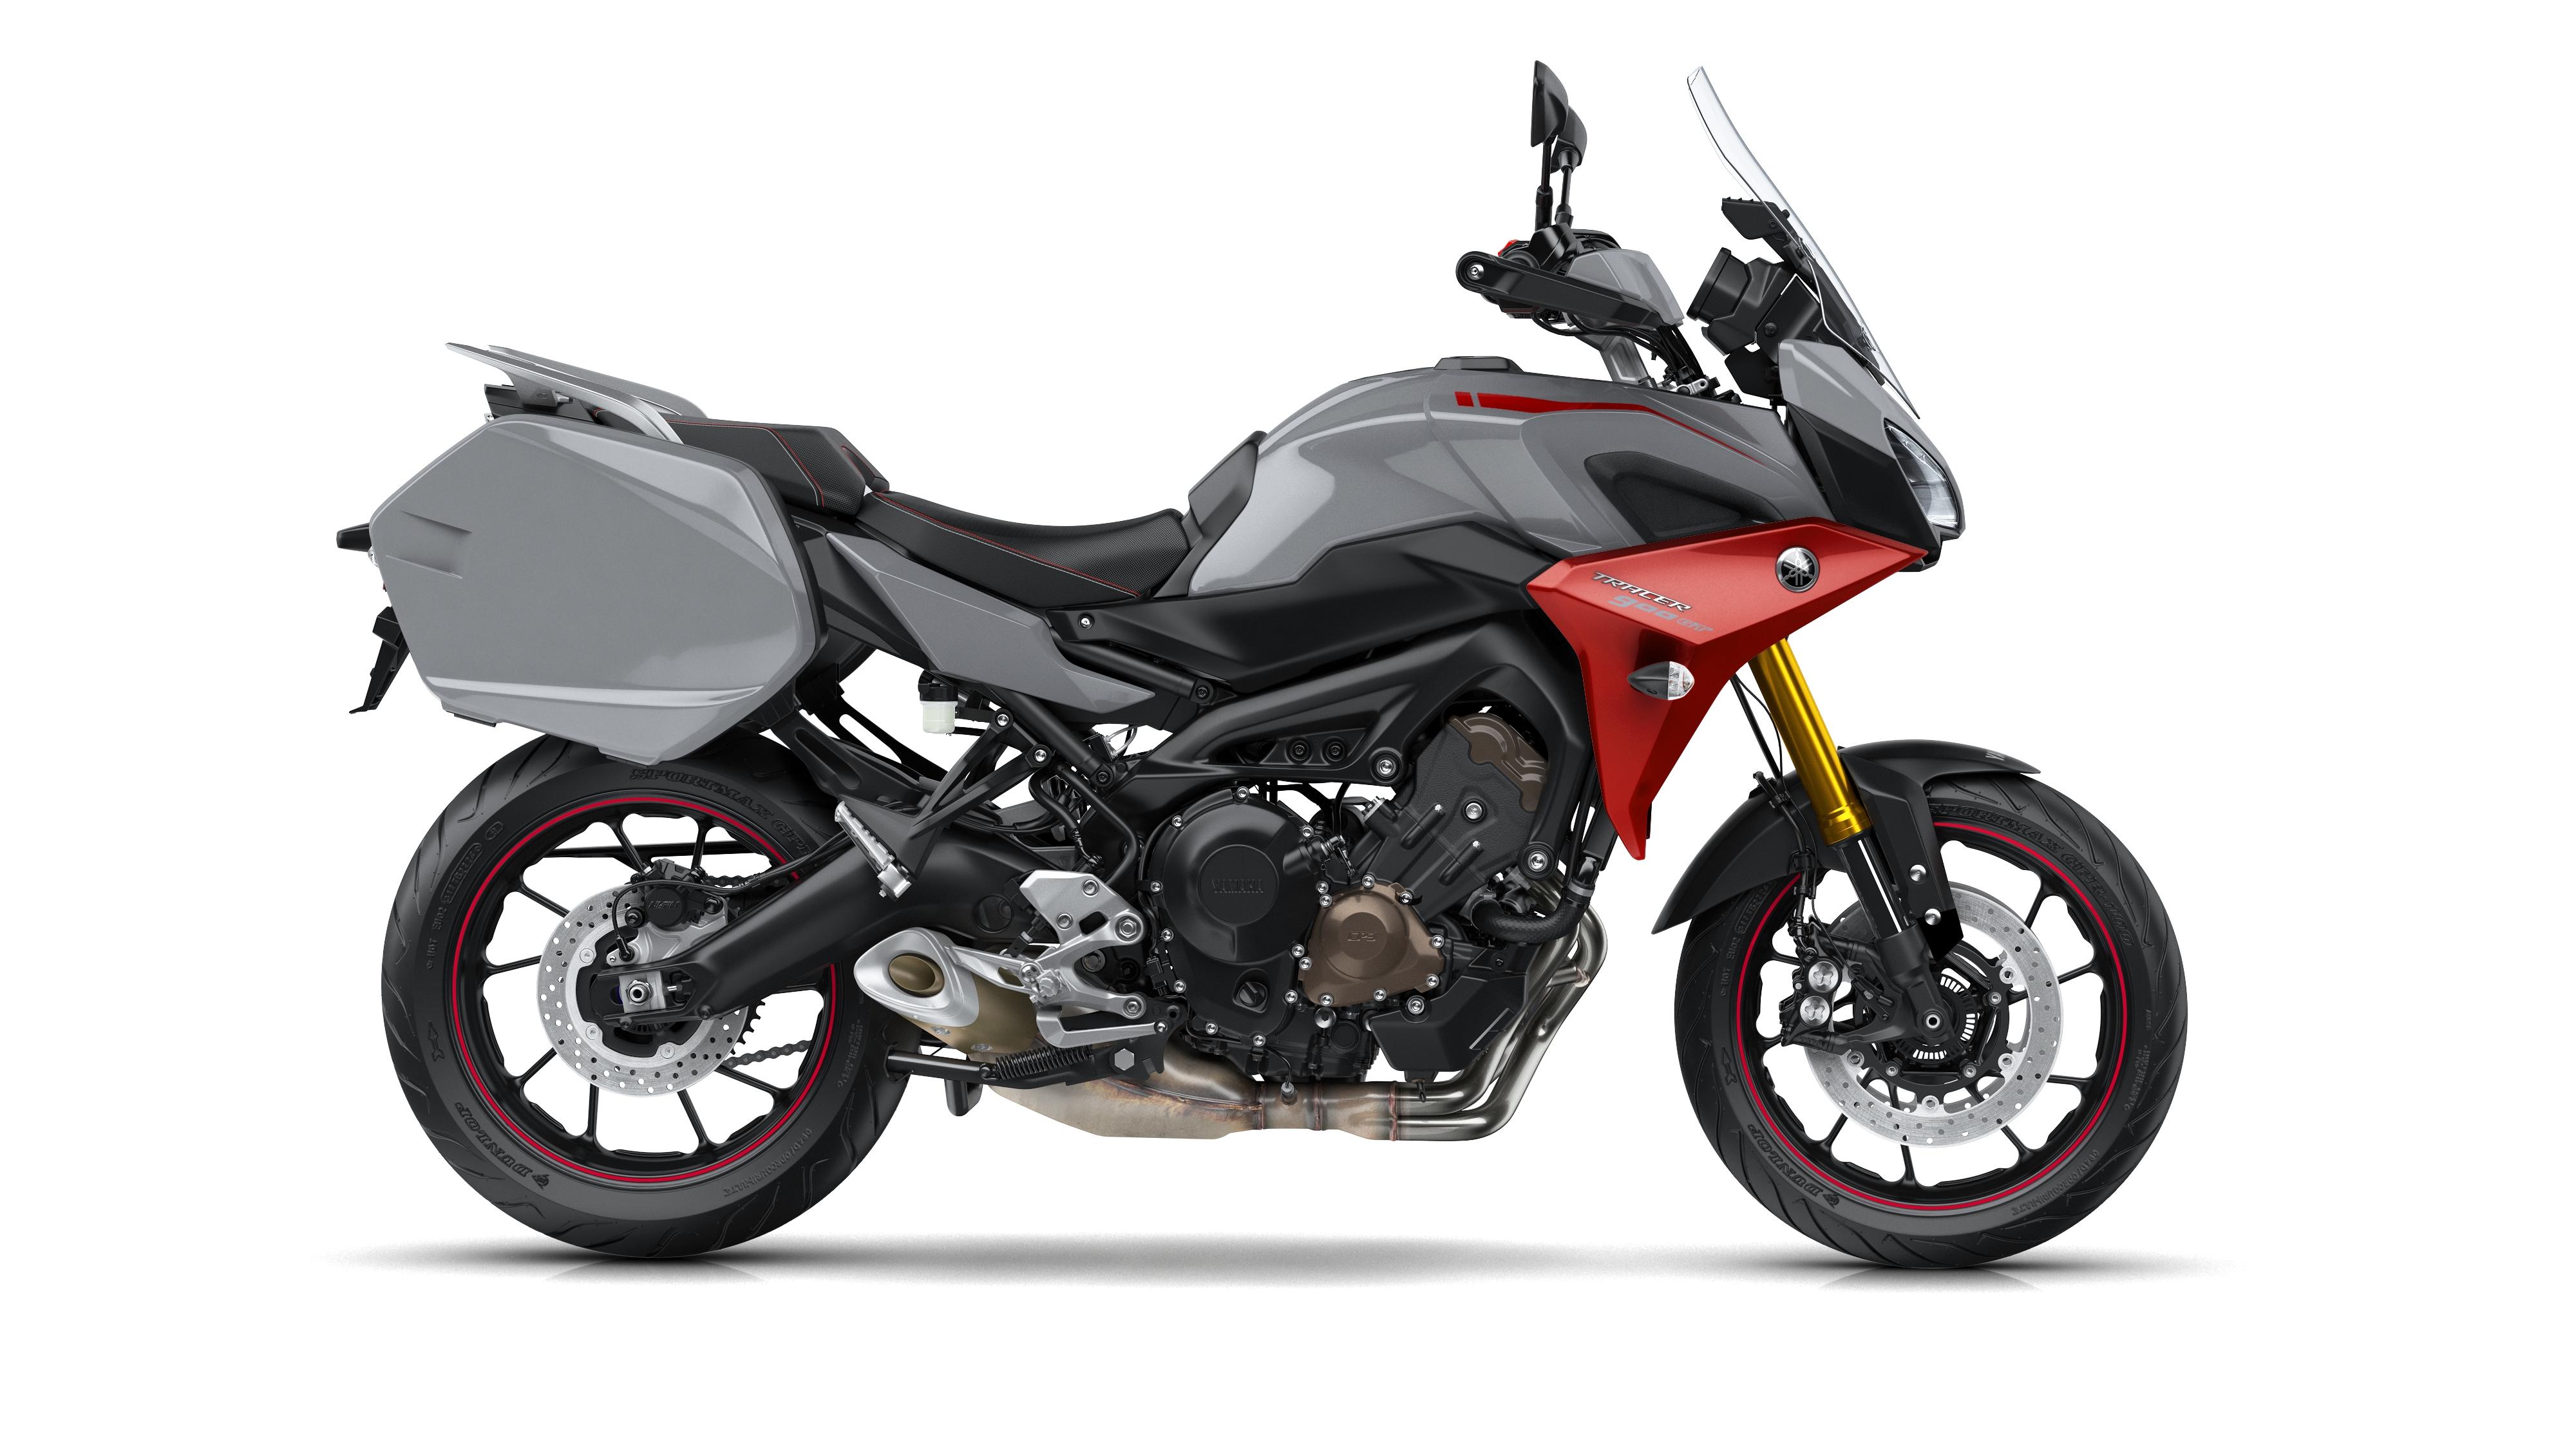 Yamaha Tracer 900 GT 2019 model